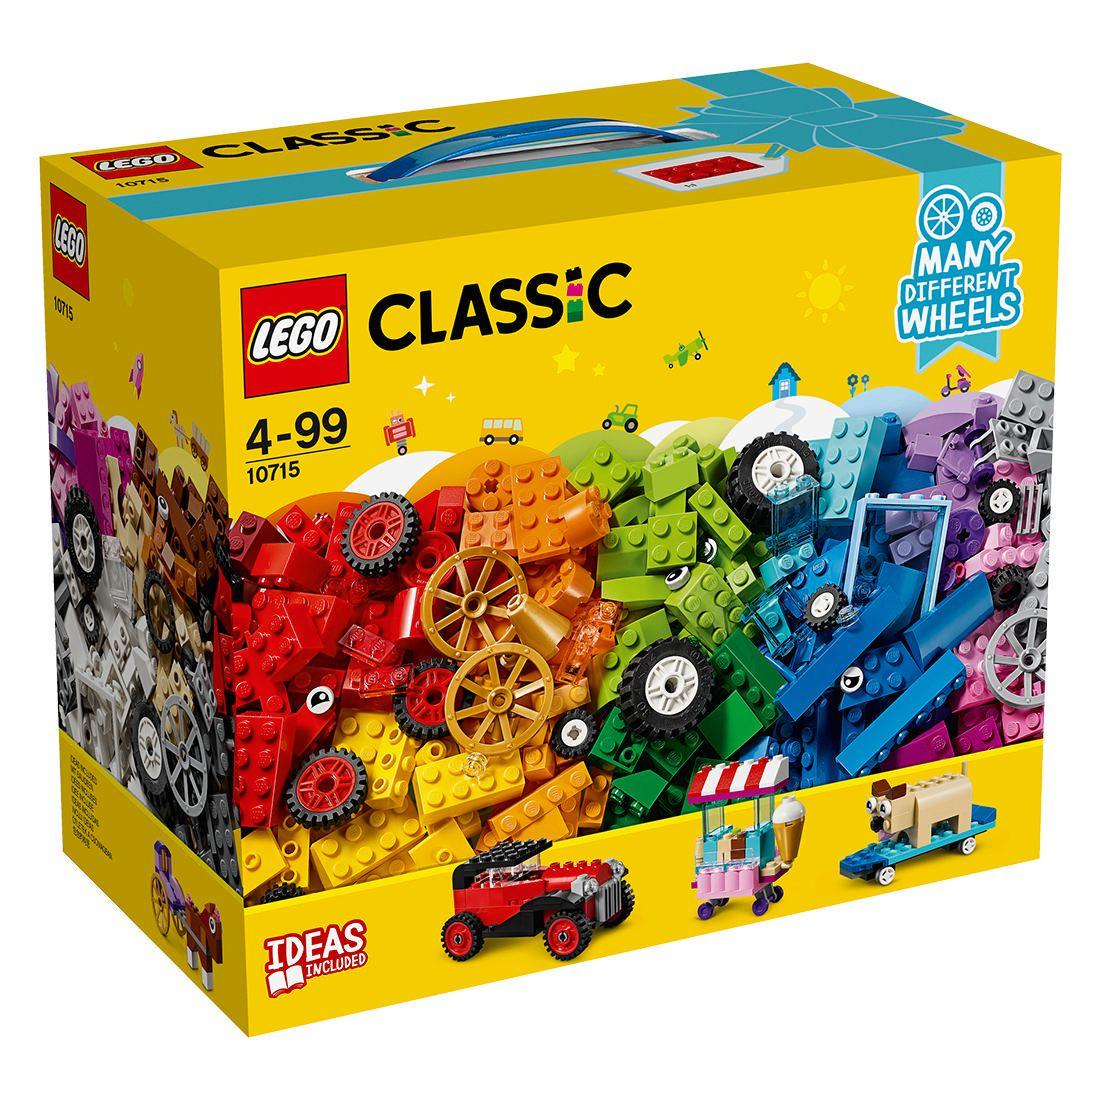 Classic Bricks on a Roll Construction Set, Colourful Vehicle Toy Bricks